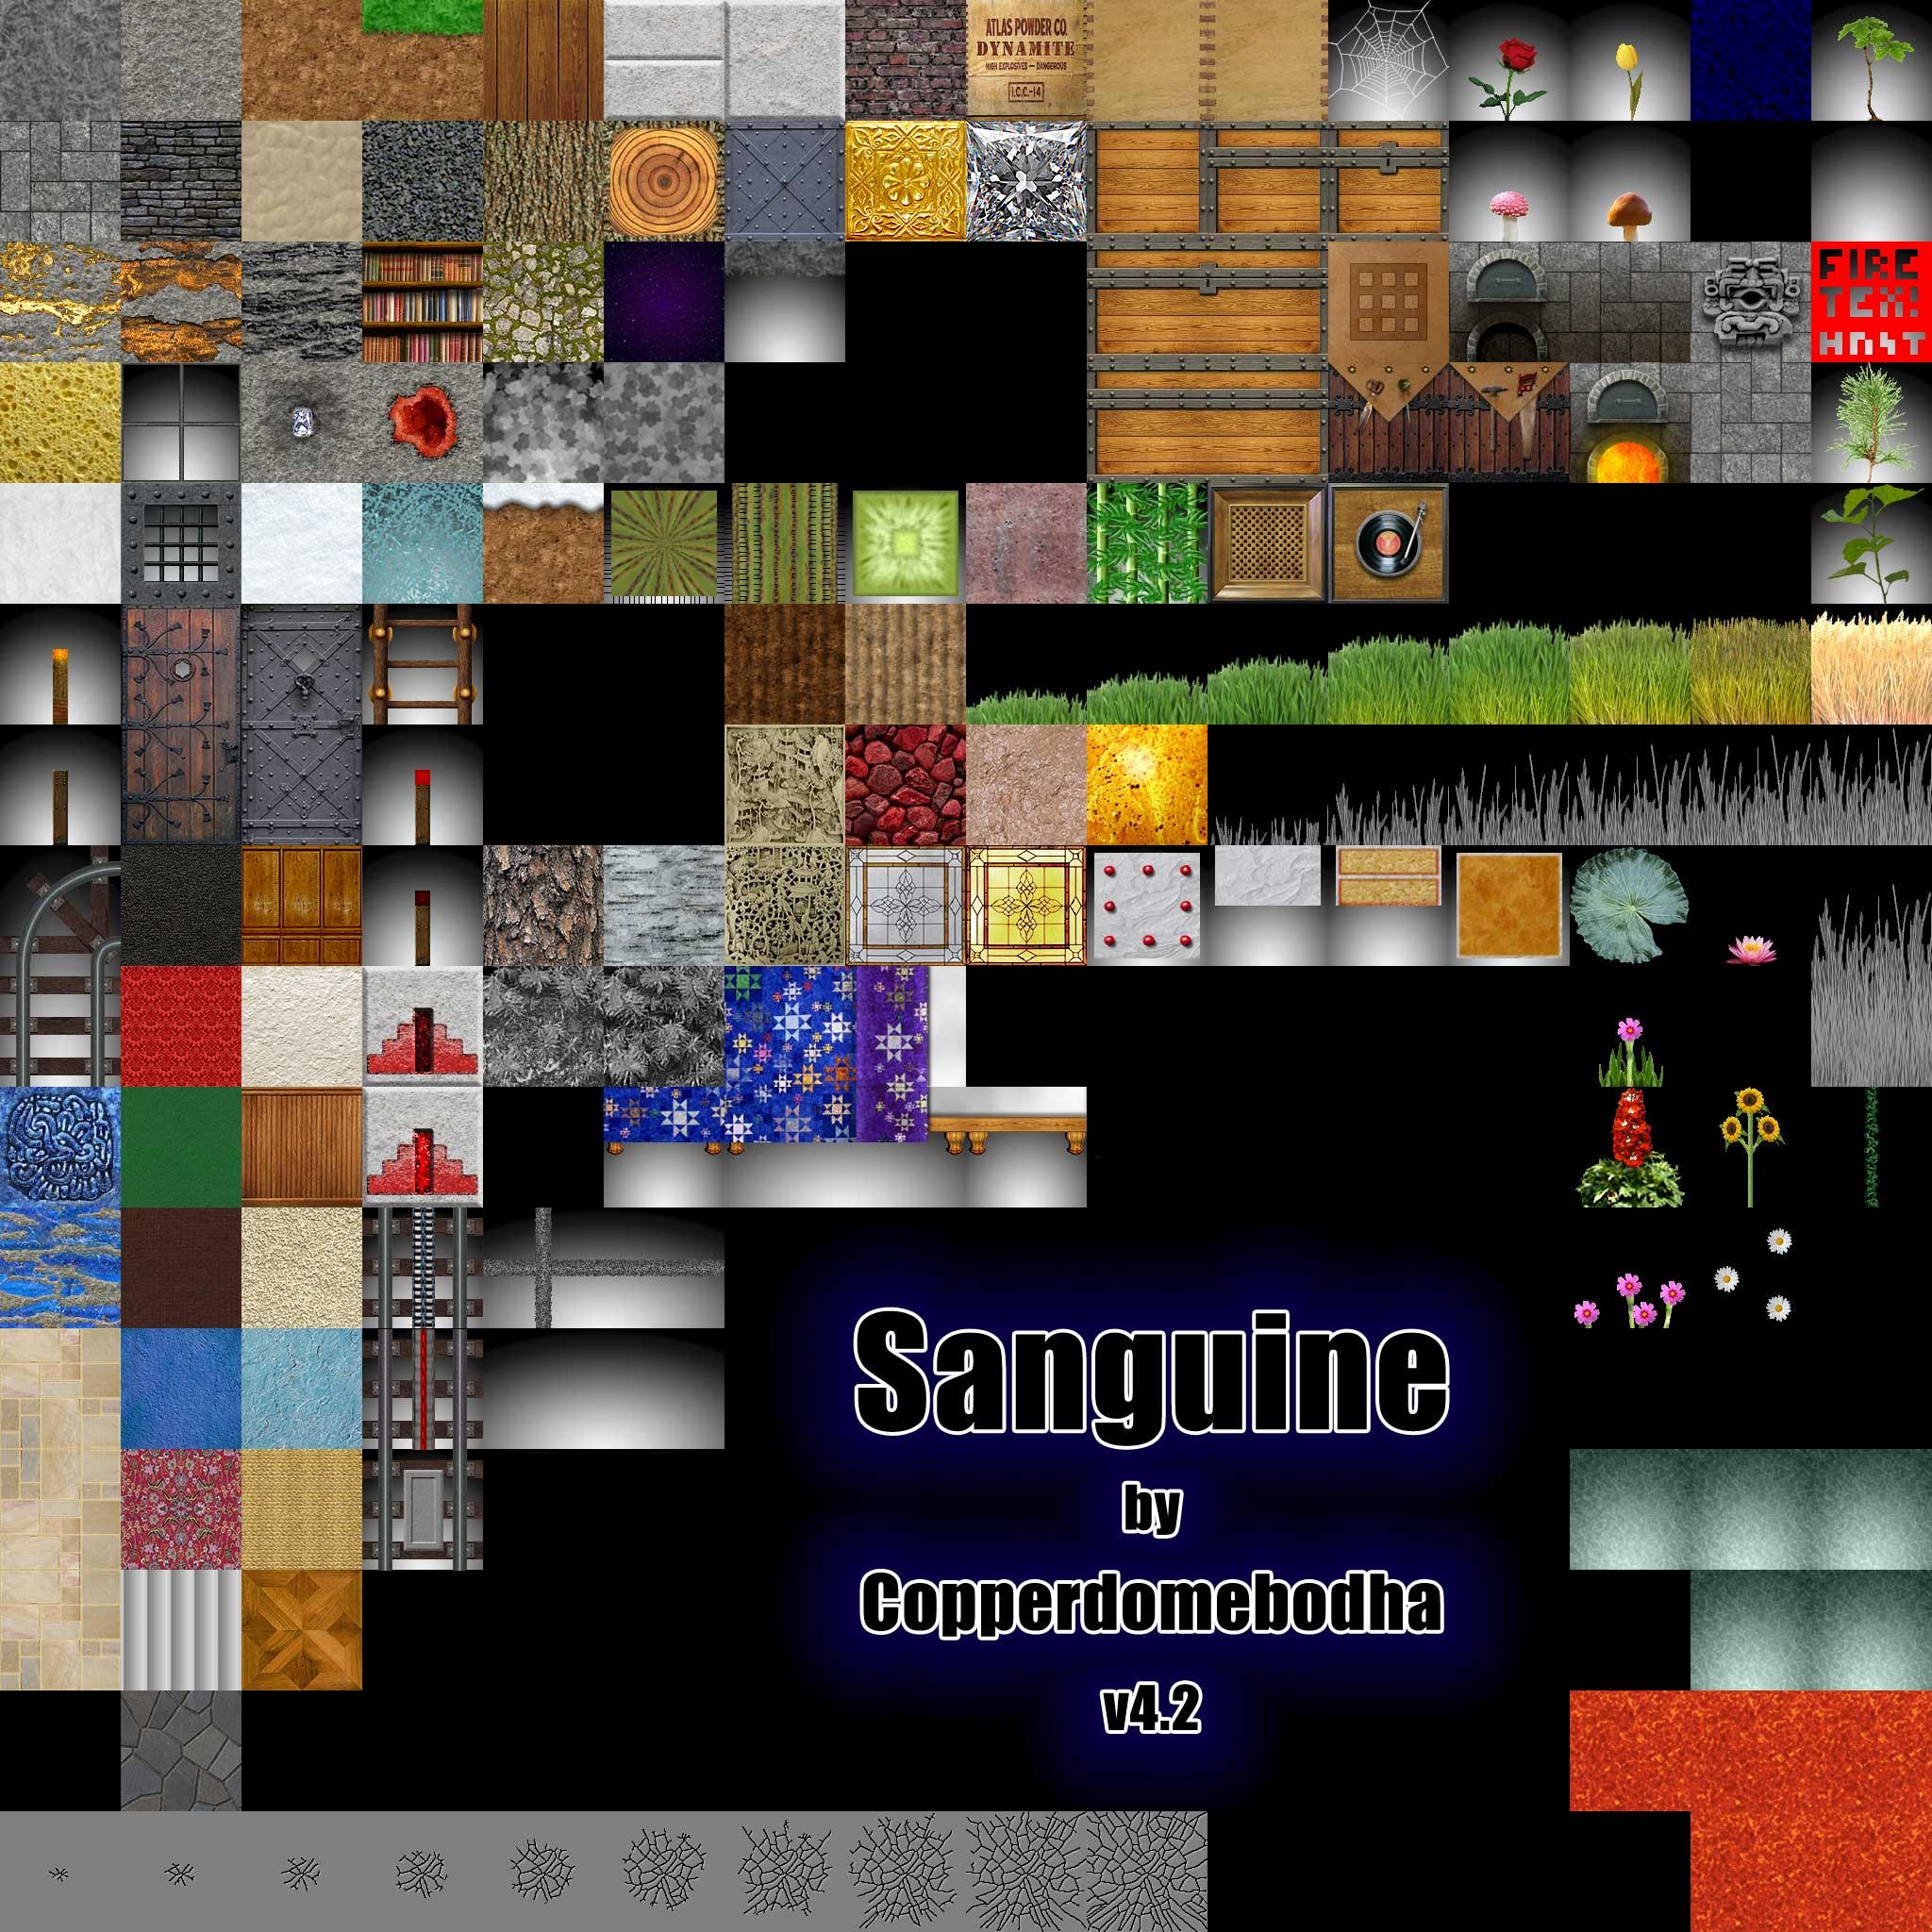 https://cdn.9pety.com/imgs/TexturePack/Sanguine-ultra-realistic-texture-pack-1.jpg